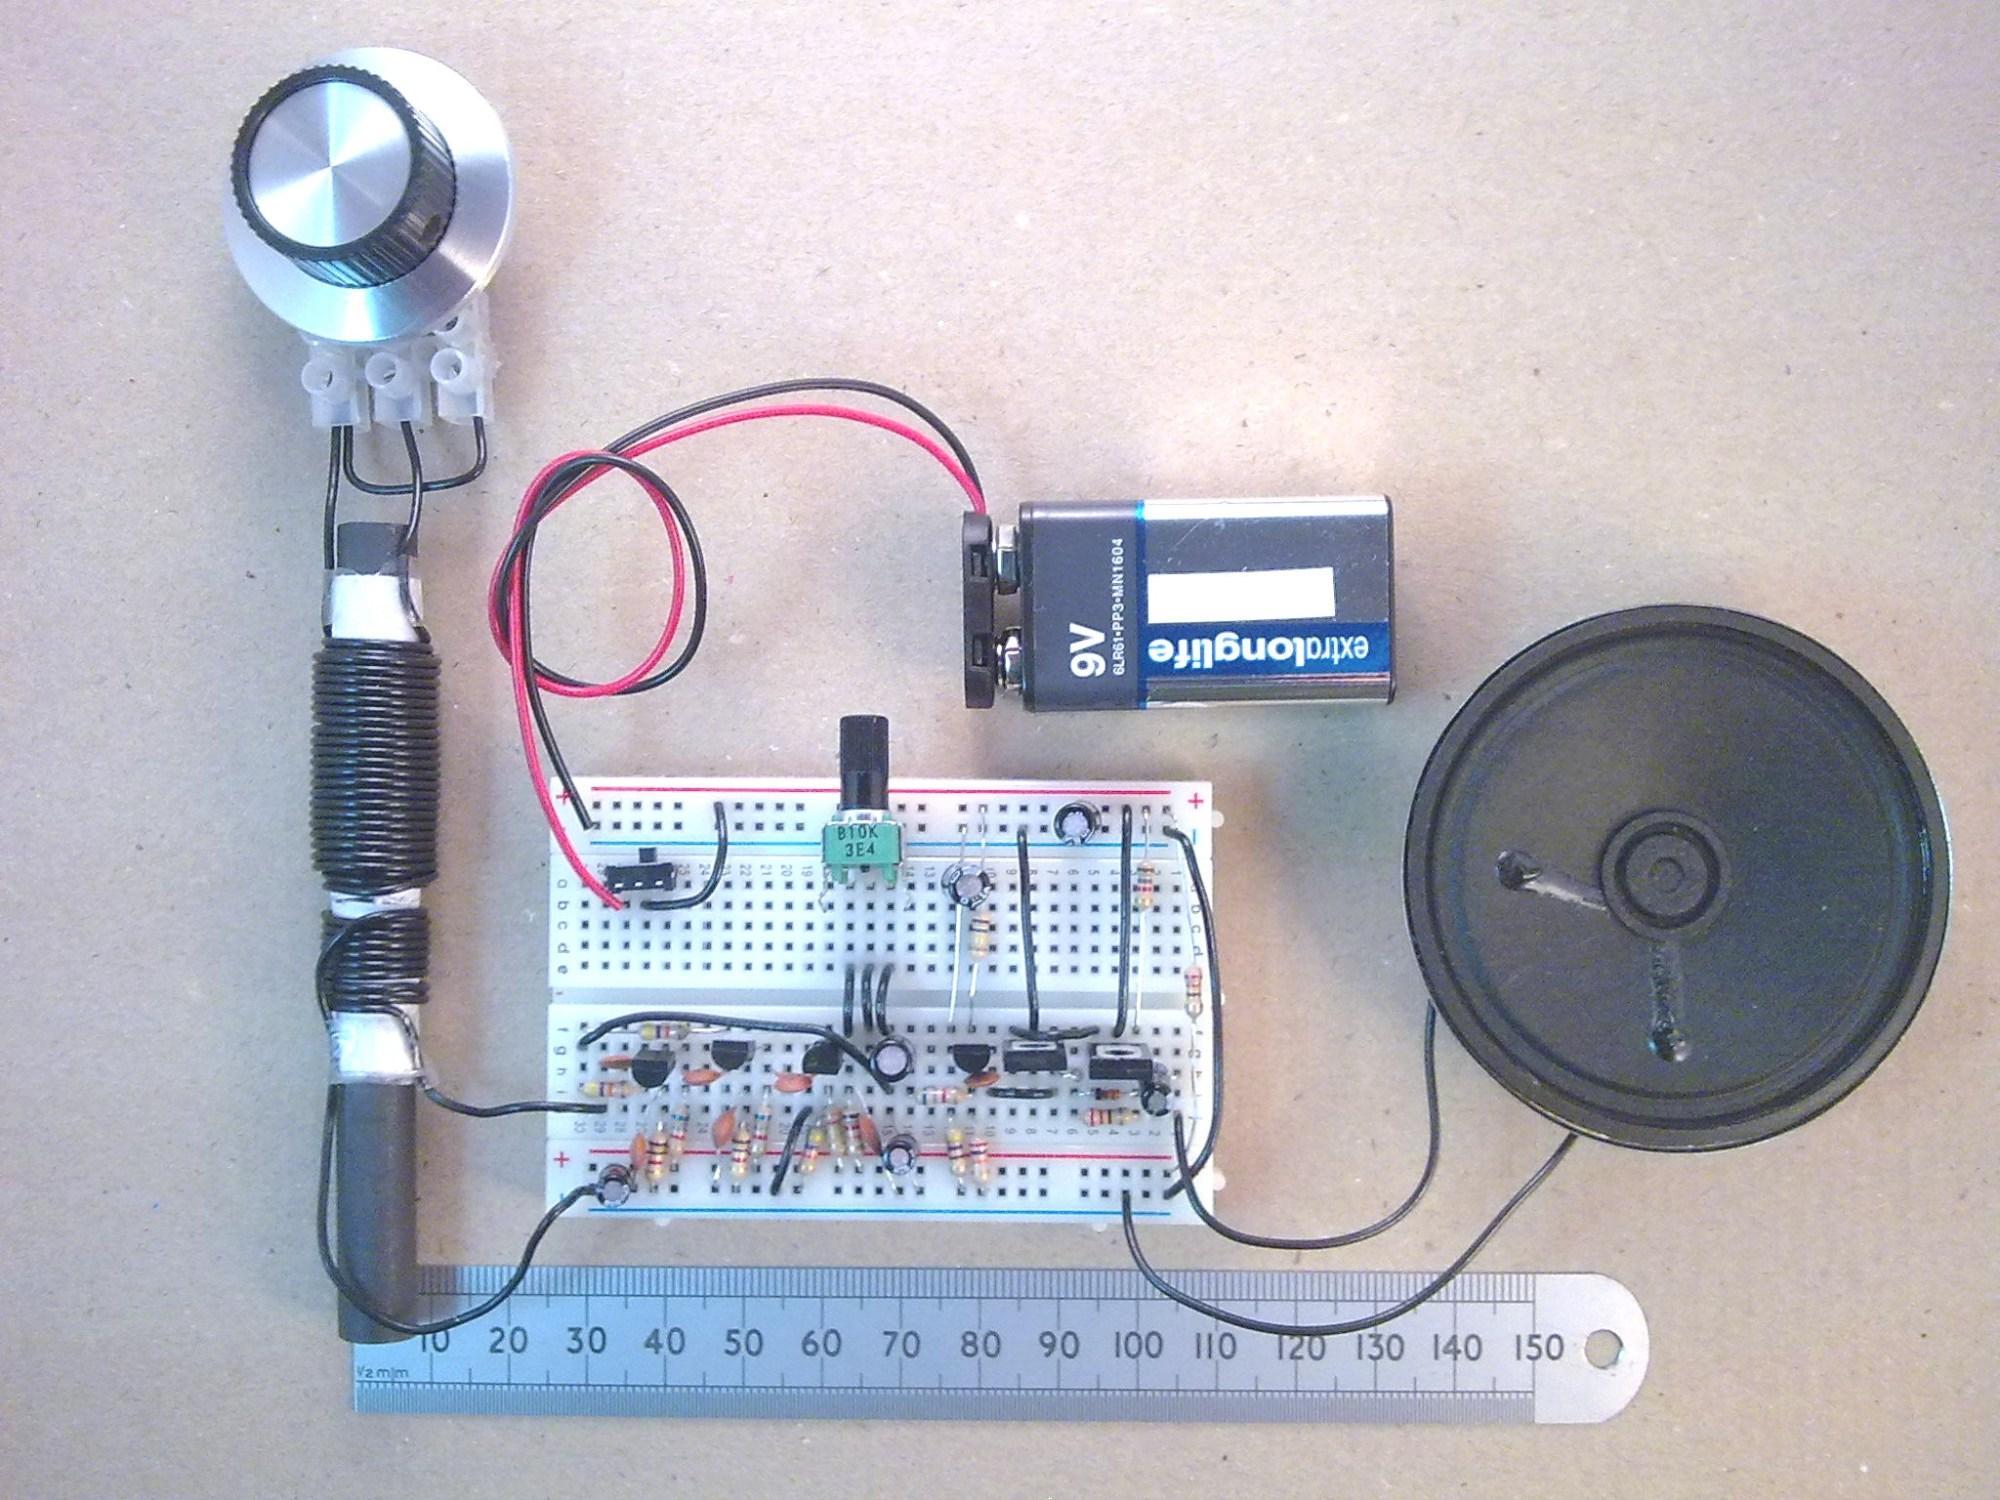 hight resolution of whole breadboard am radio kit built up